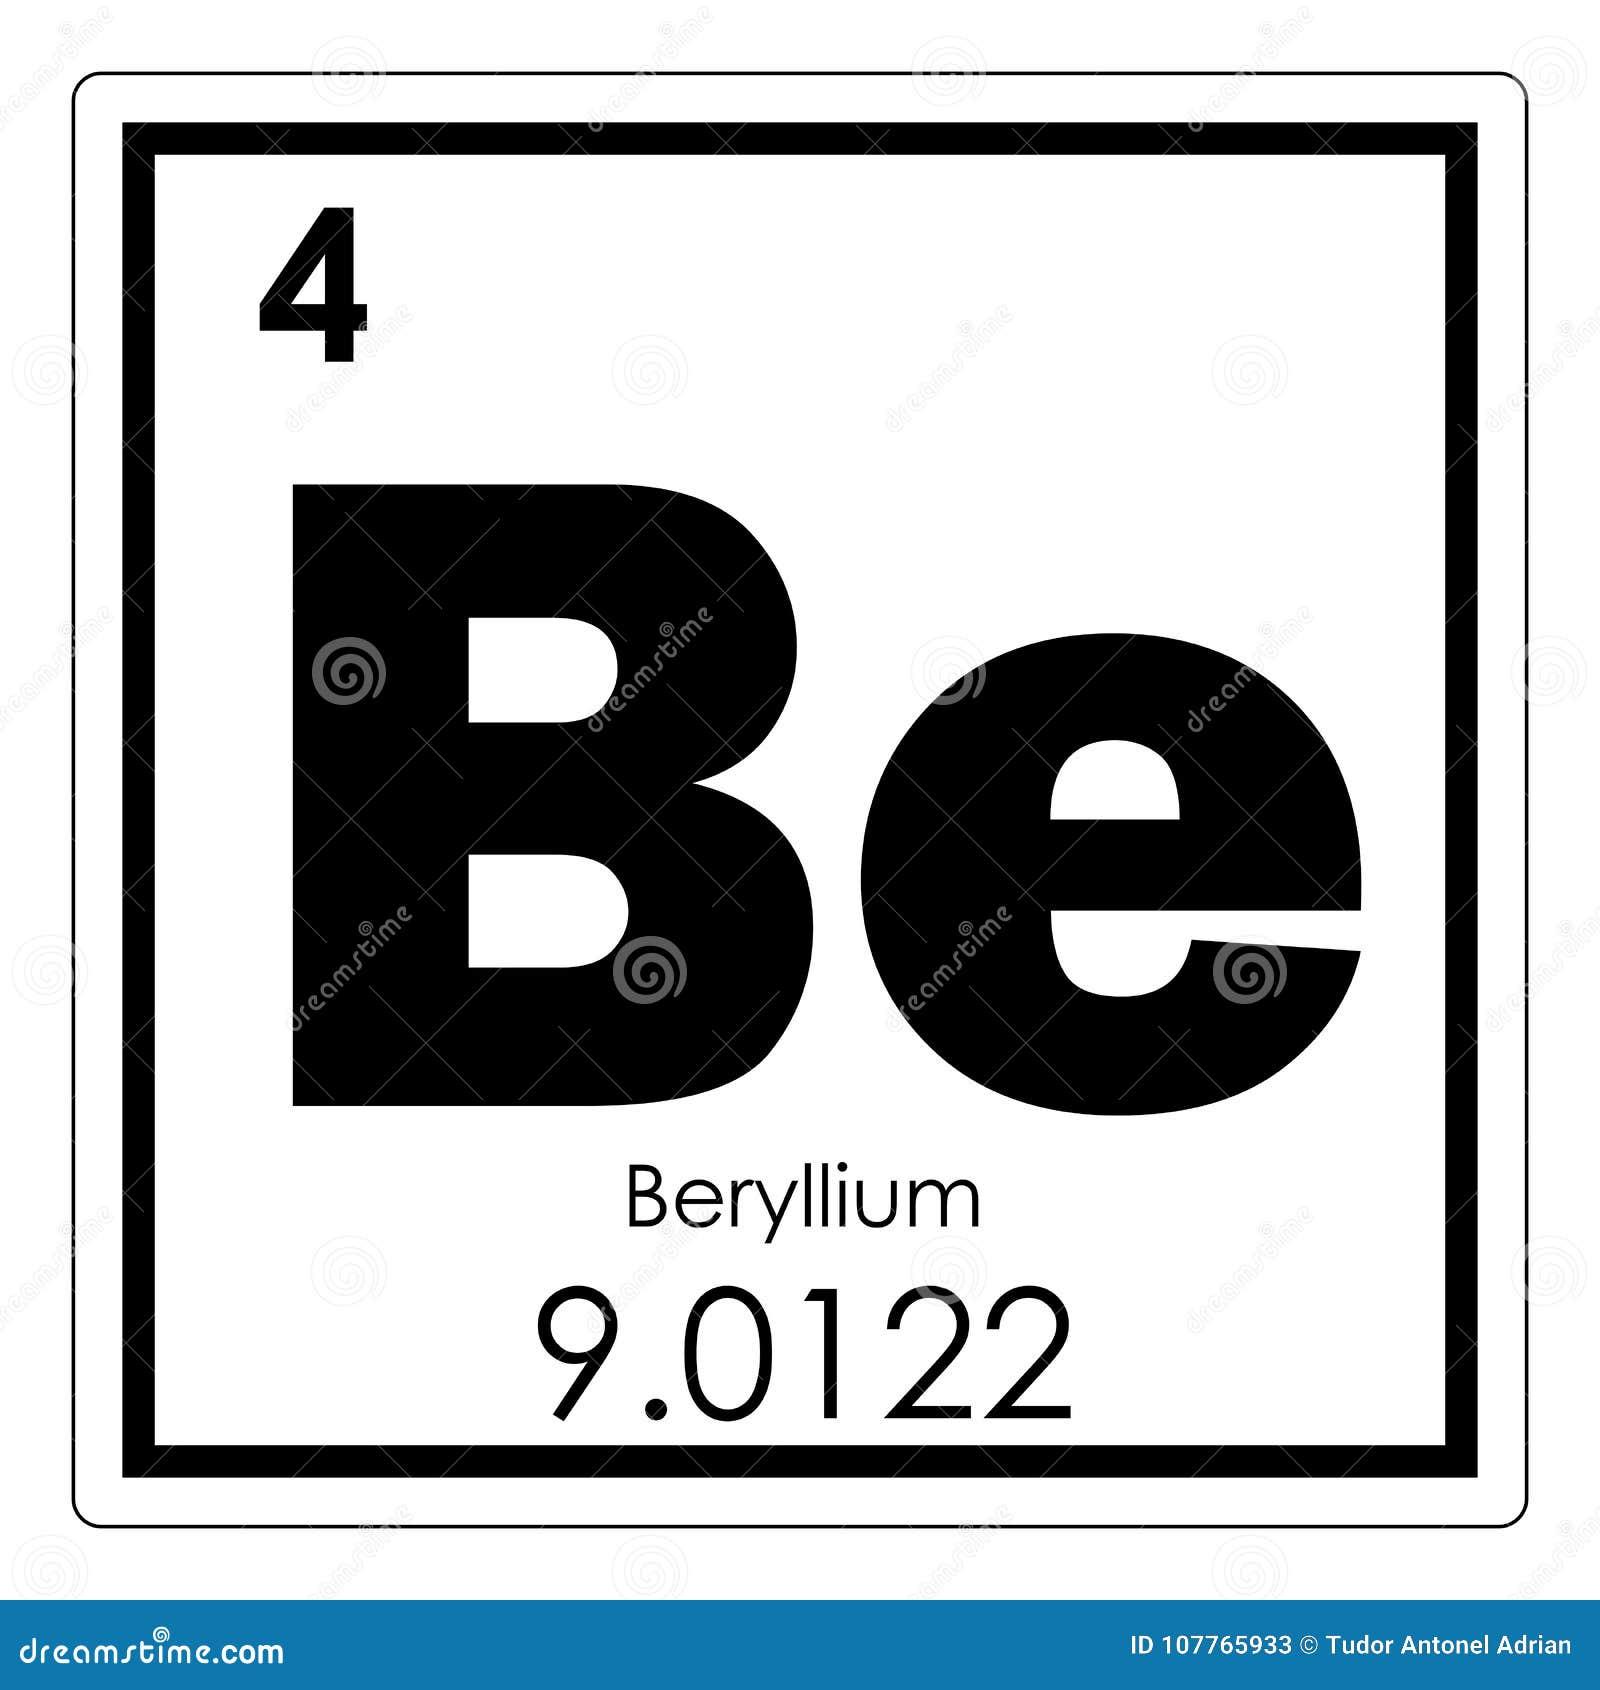 Beryllium Chemical Element Stock Illustration Illustration Of